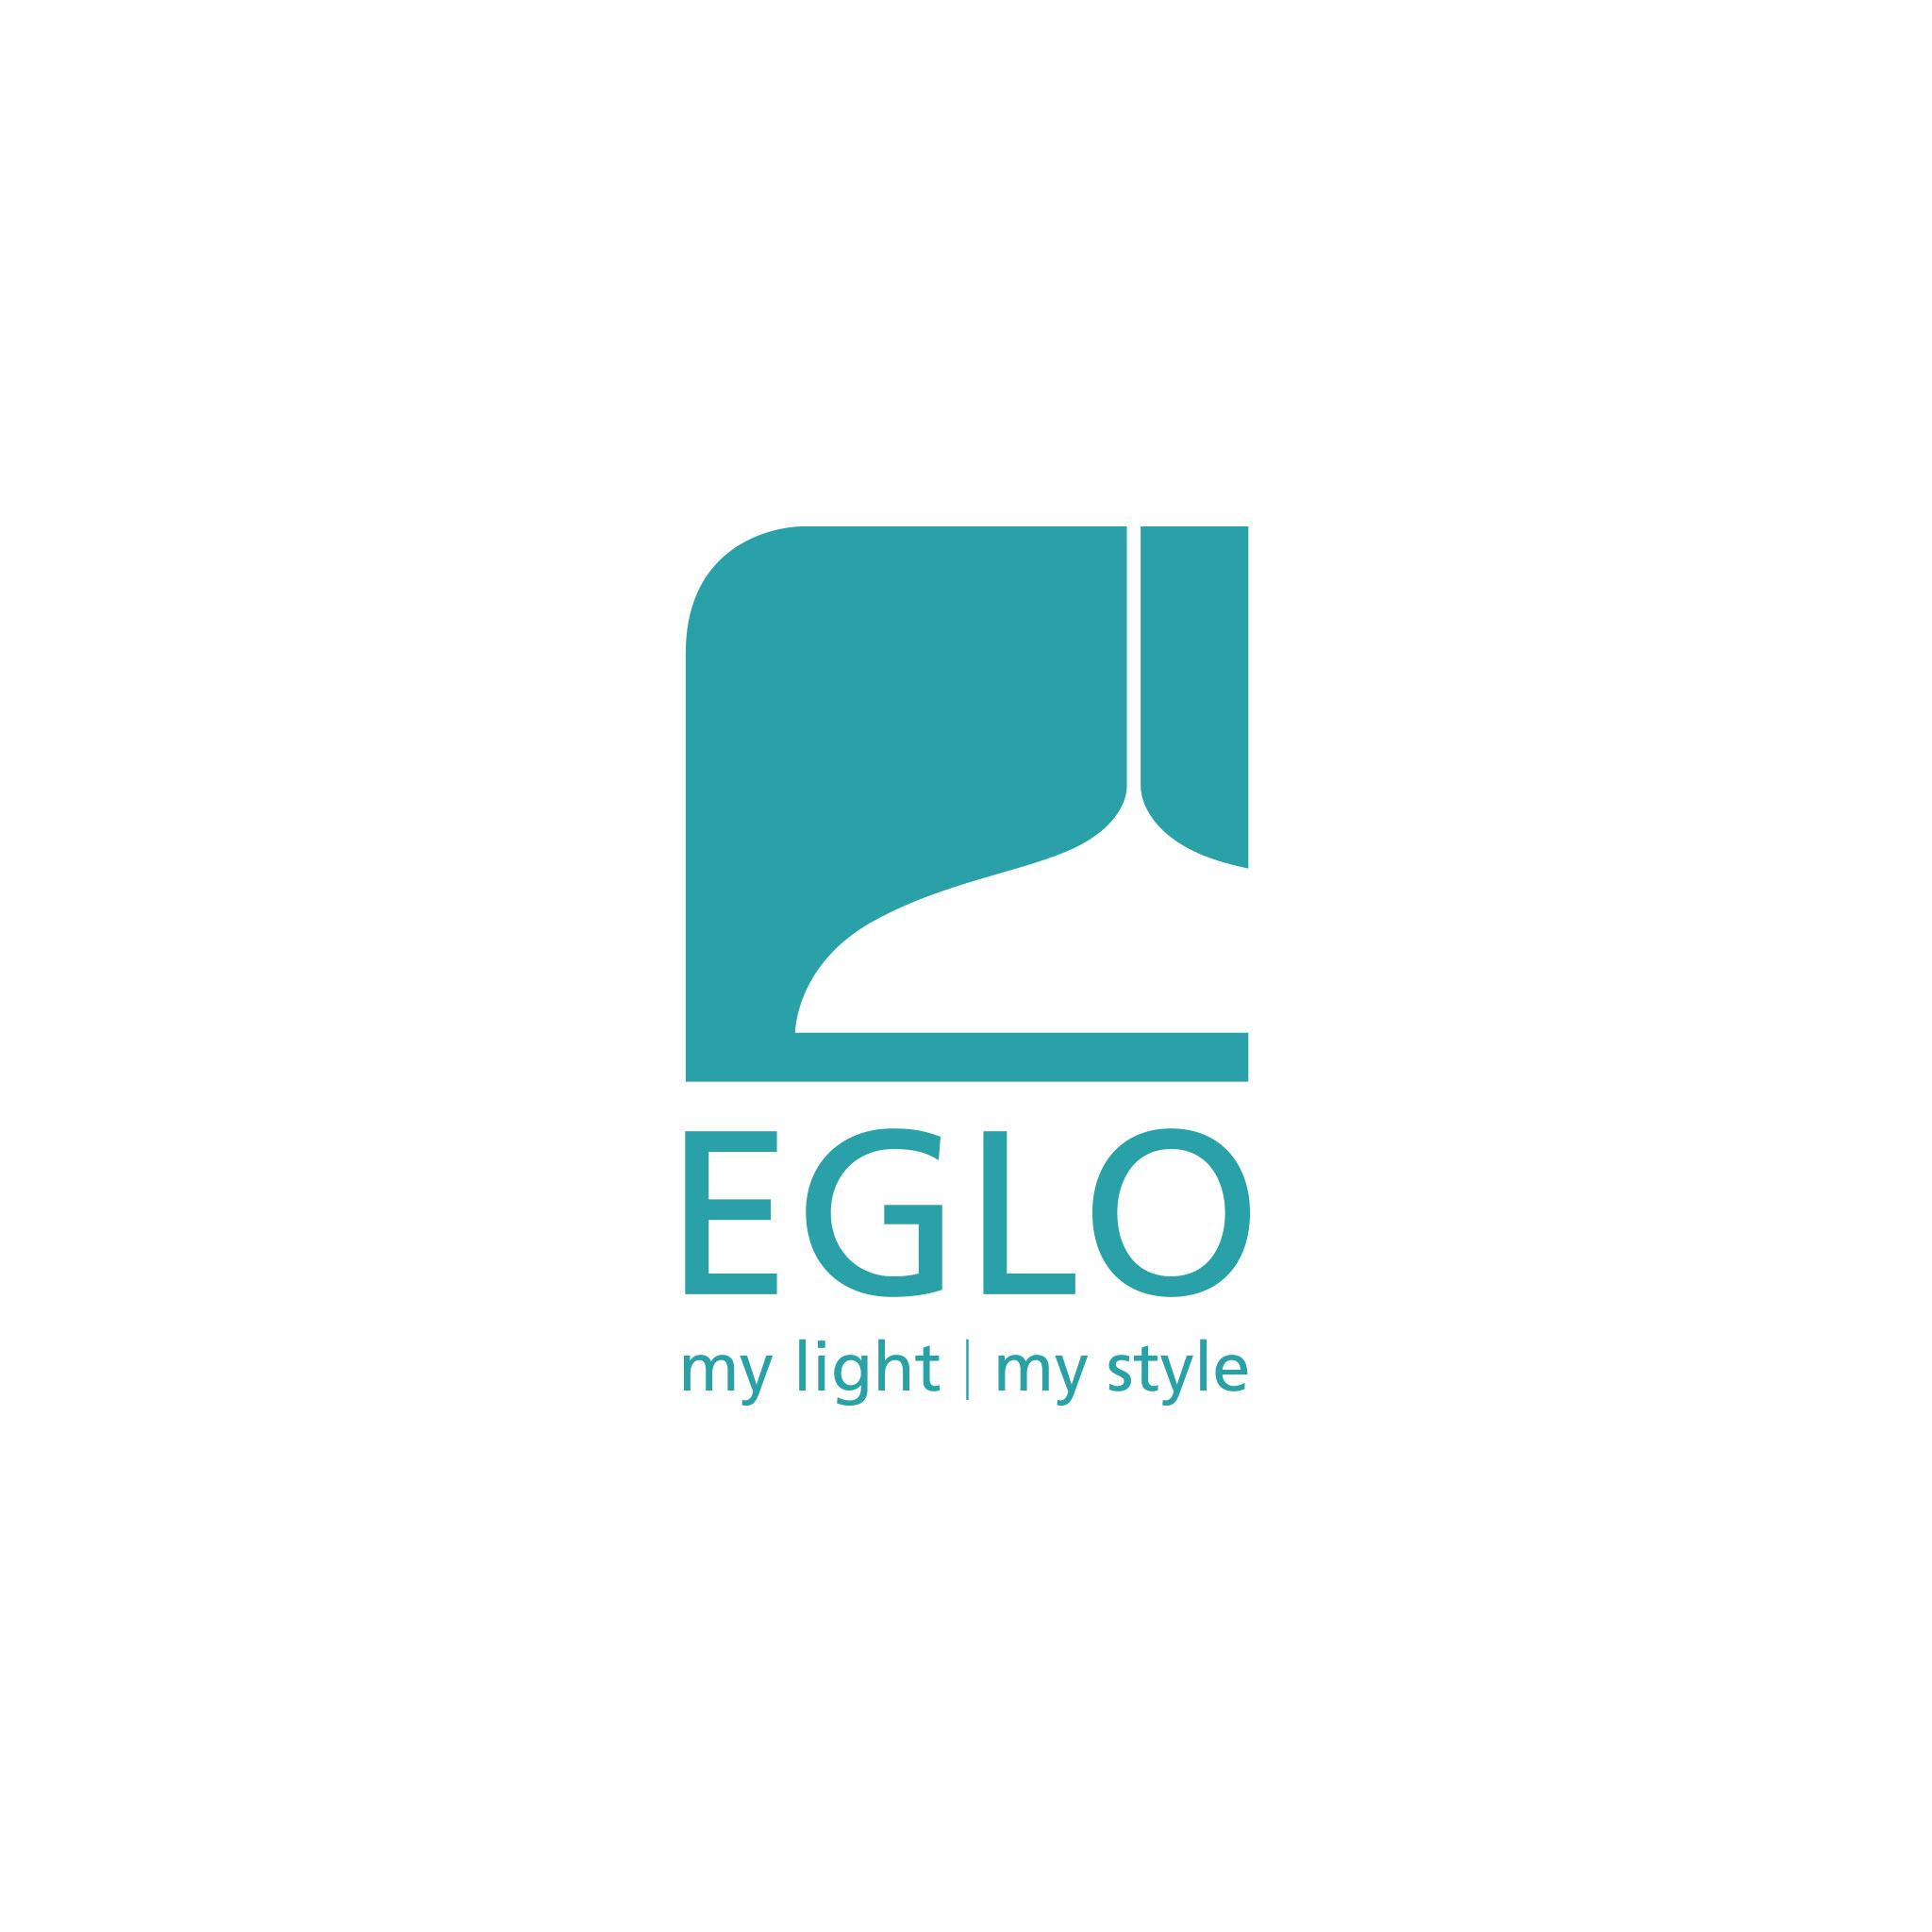 ilu_eglo